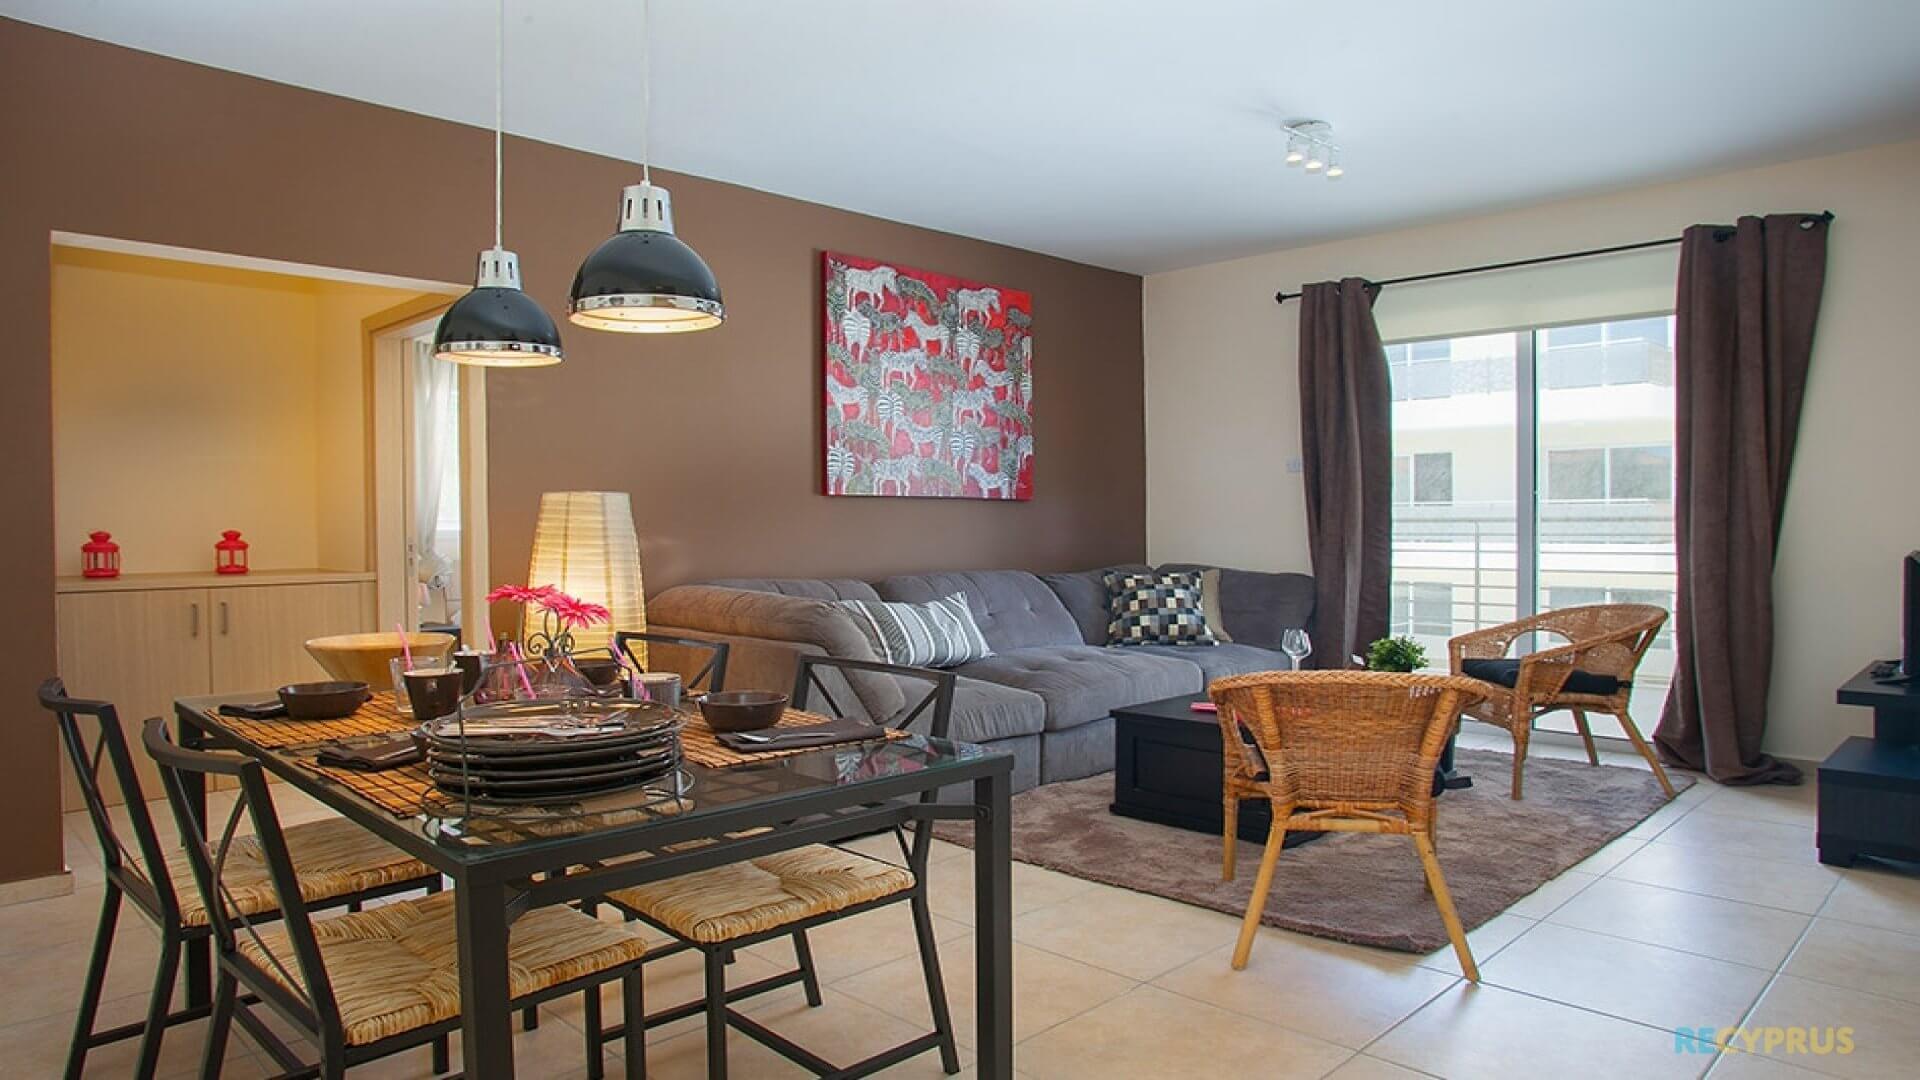 Apartment for sale Kapparis Famagusta Cyprus 1 3442